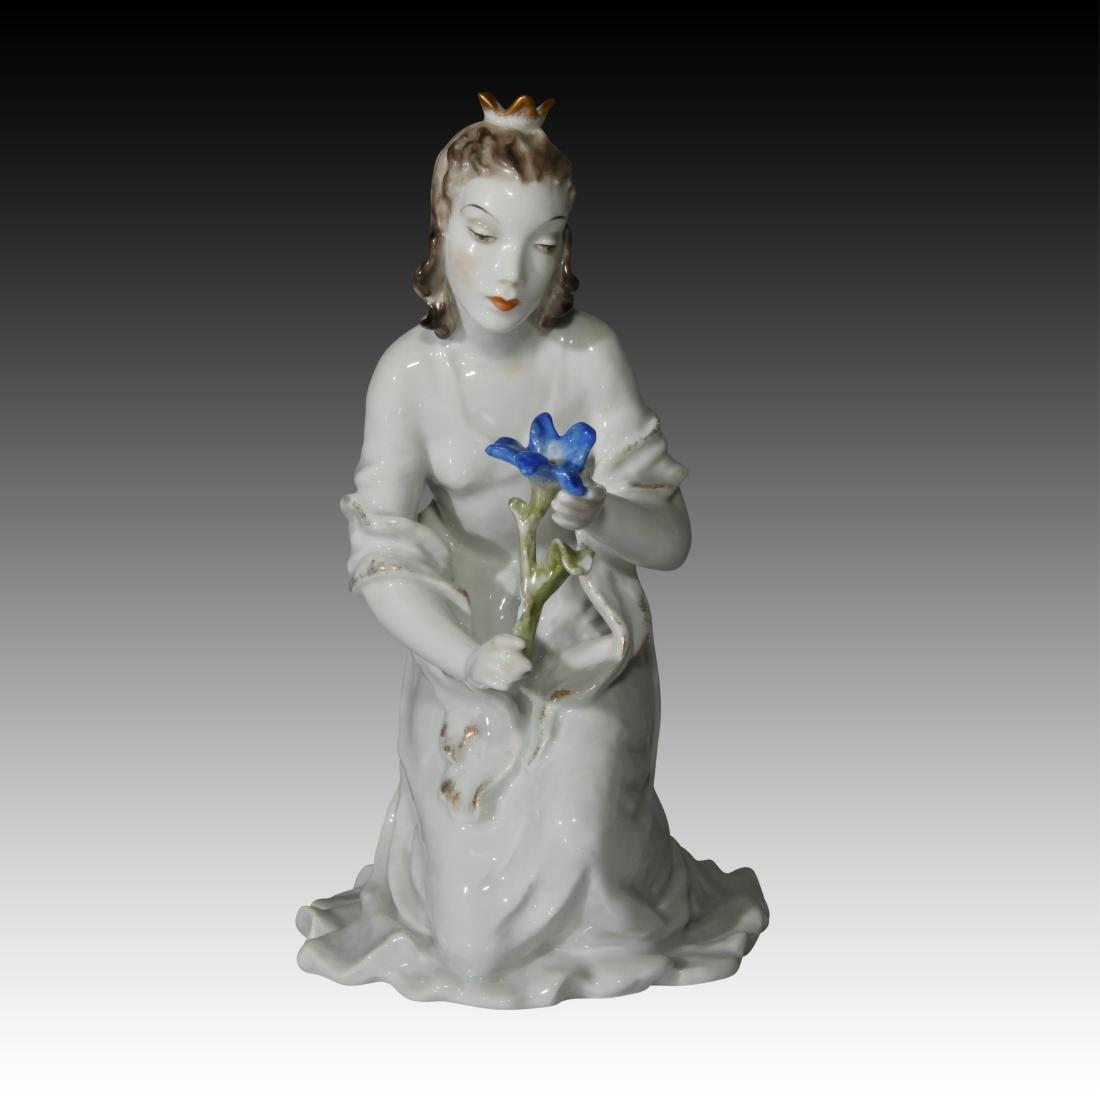 Rosenthal Figurine Princess with Flower # 7012